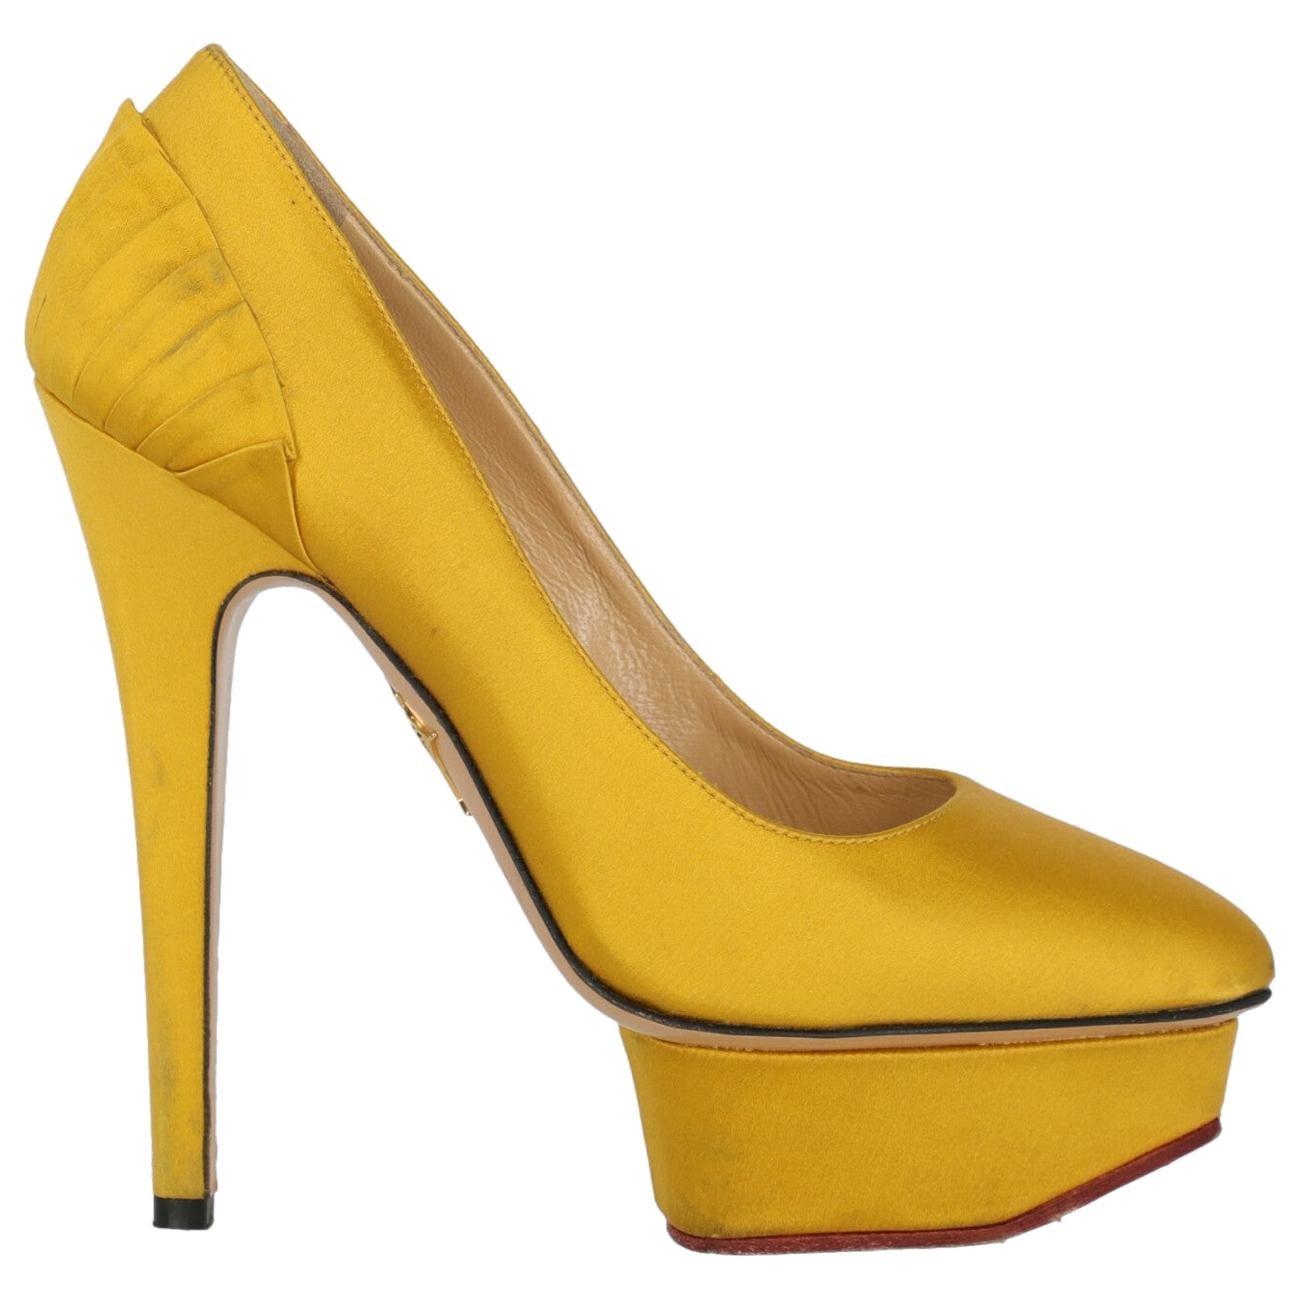 Charlotte Olympia Woman Pumps Yellow Fabric IT 36